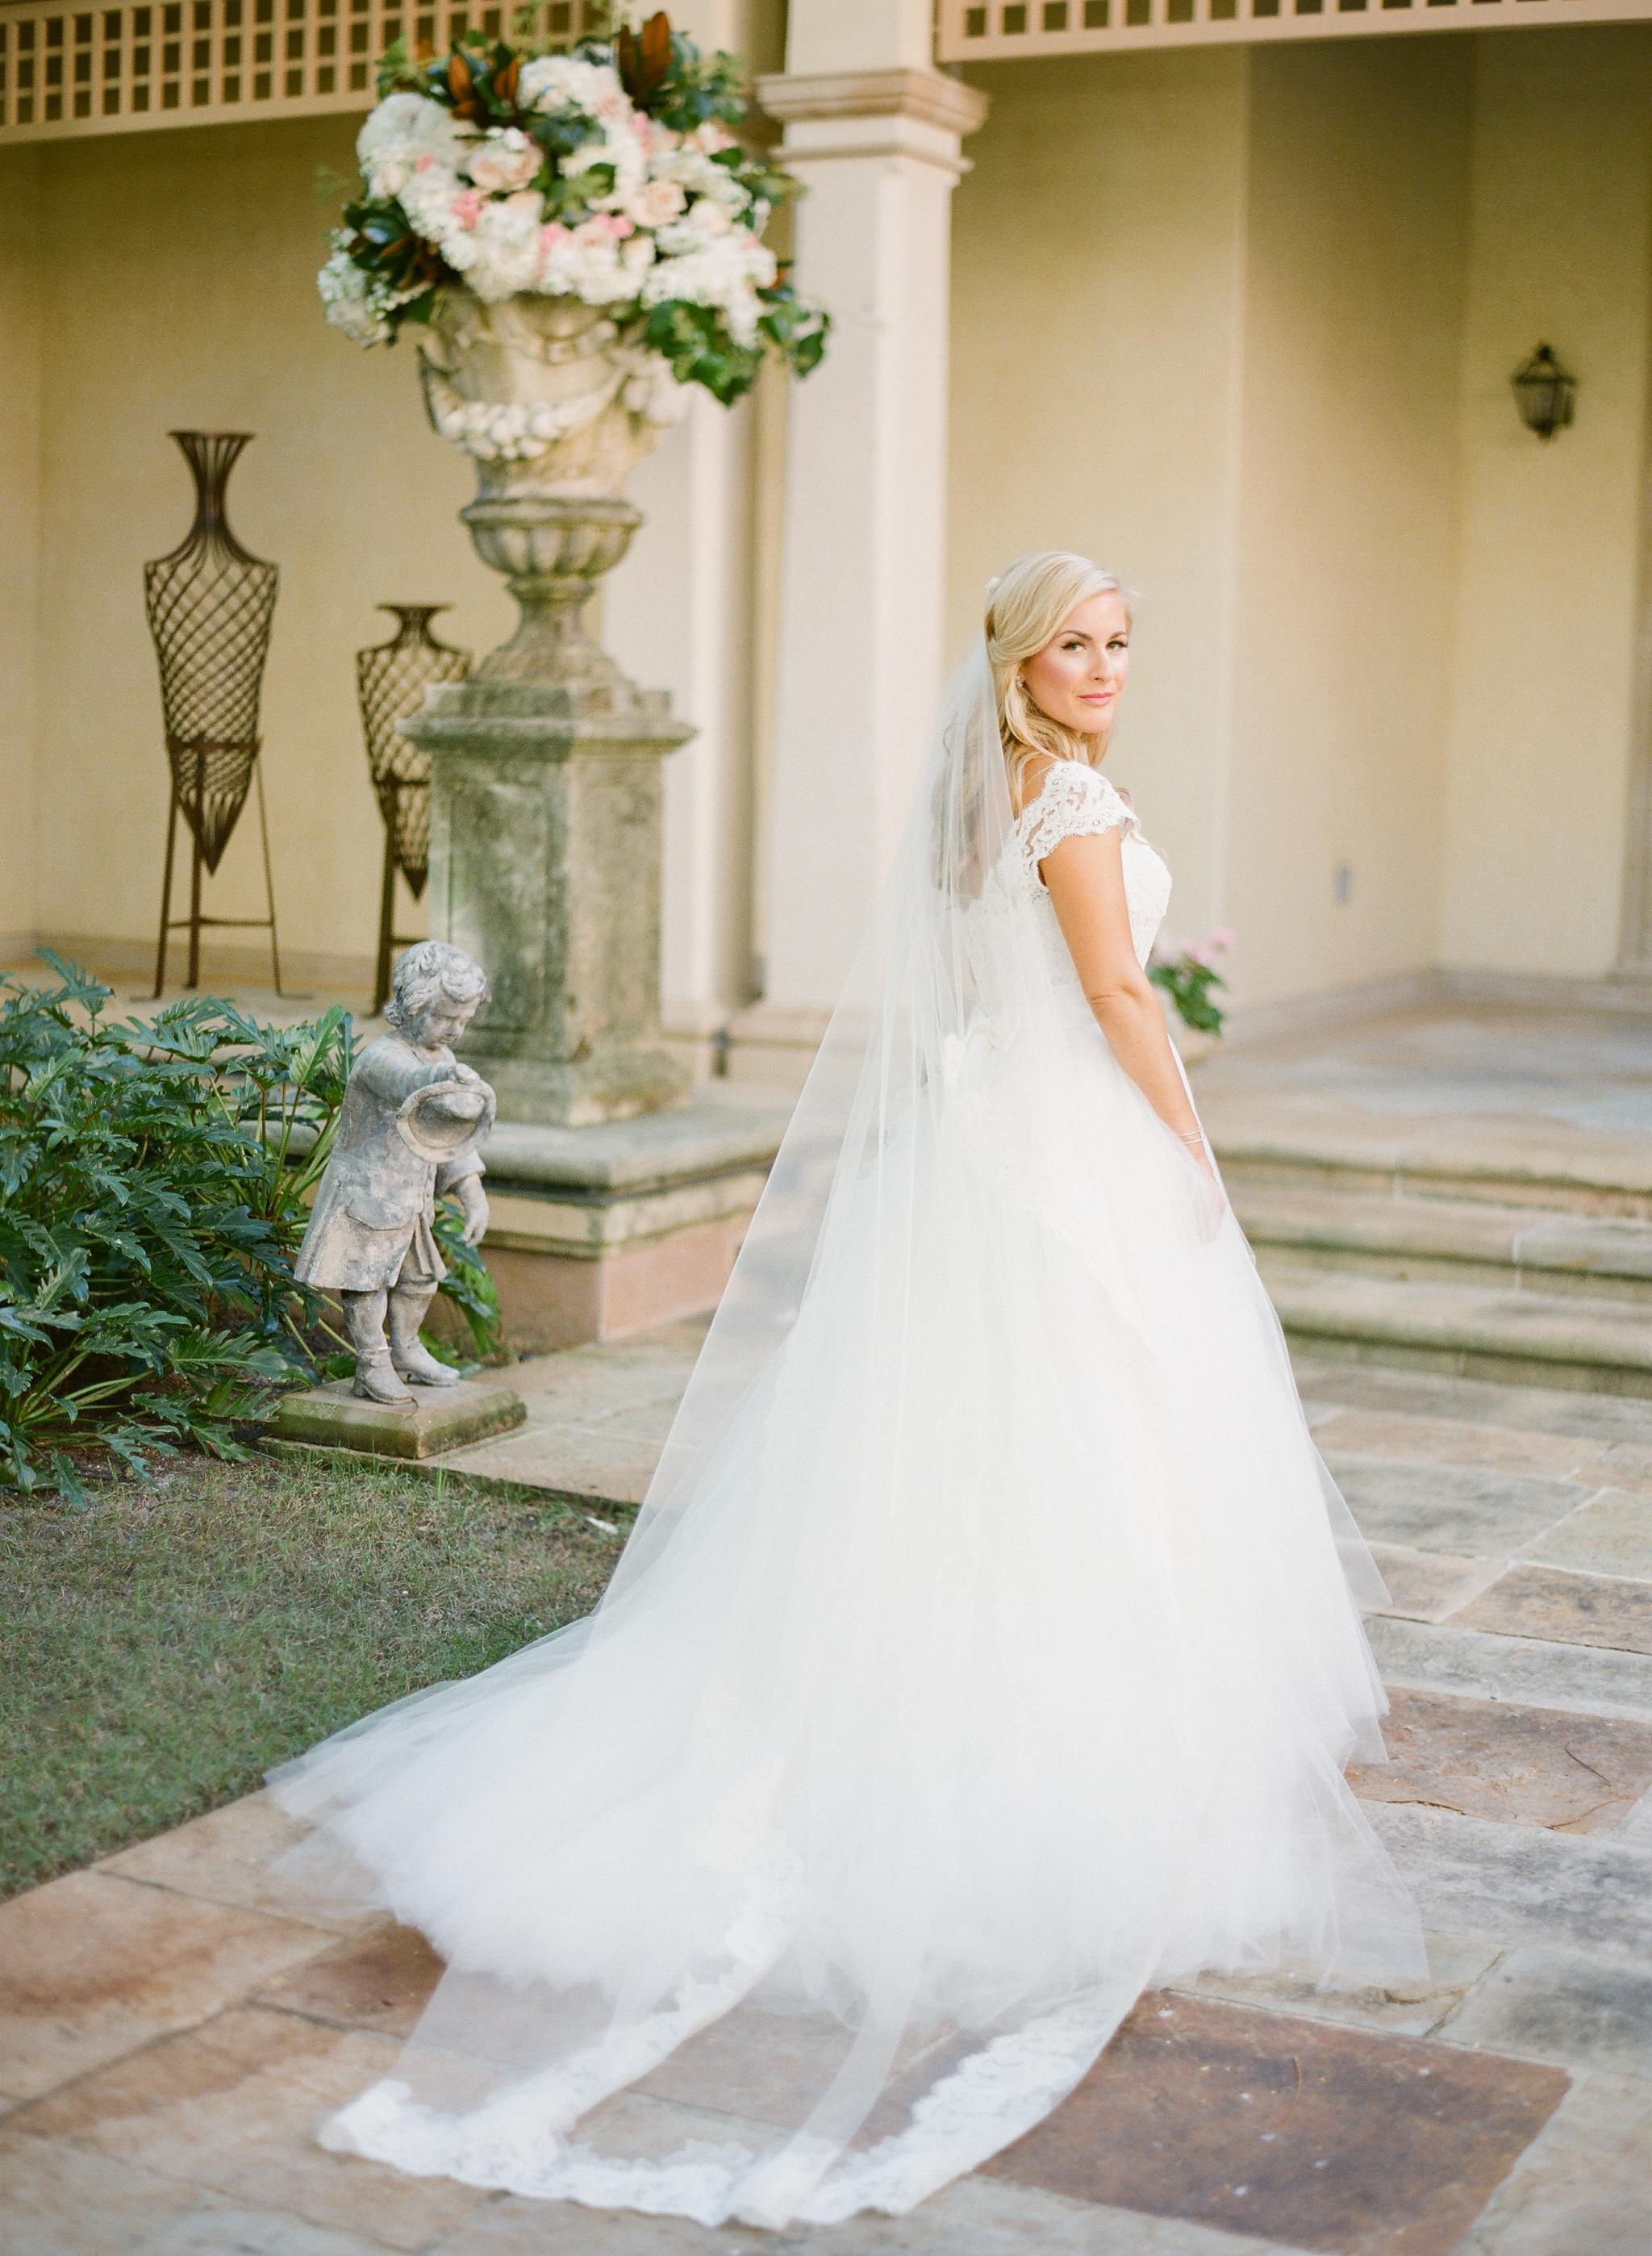 Ceci_New_York_Florida_Wedding_Style_Bride_Watercolor_Real_Custom_Luxury_51.jpg